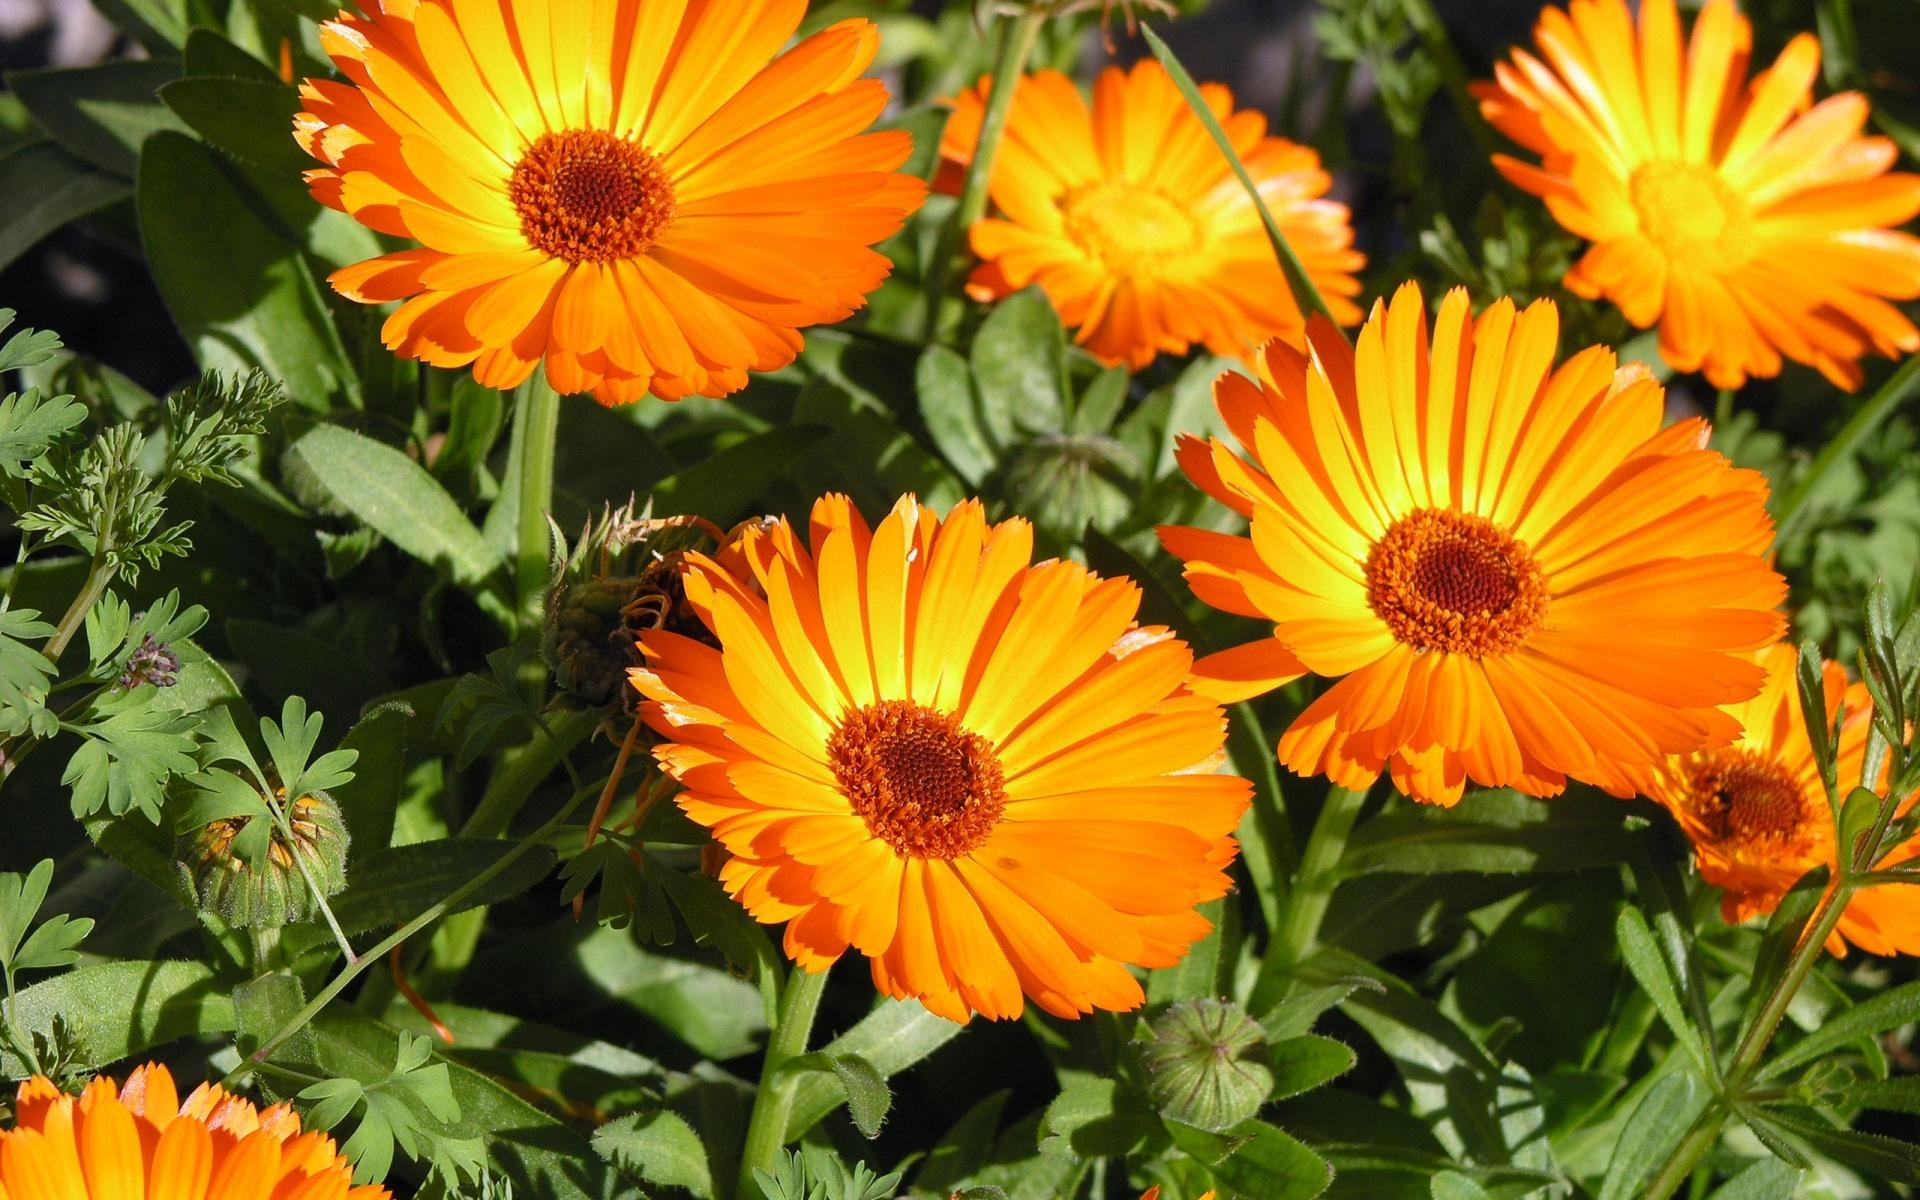 خلفيات ورد 2014 - اجمل خلفيات ورد - خلفيات ورد جديدة 2014 orange-flowers-wallpapers_11073_1920x1200.jpg